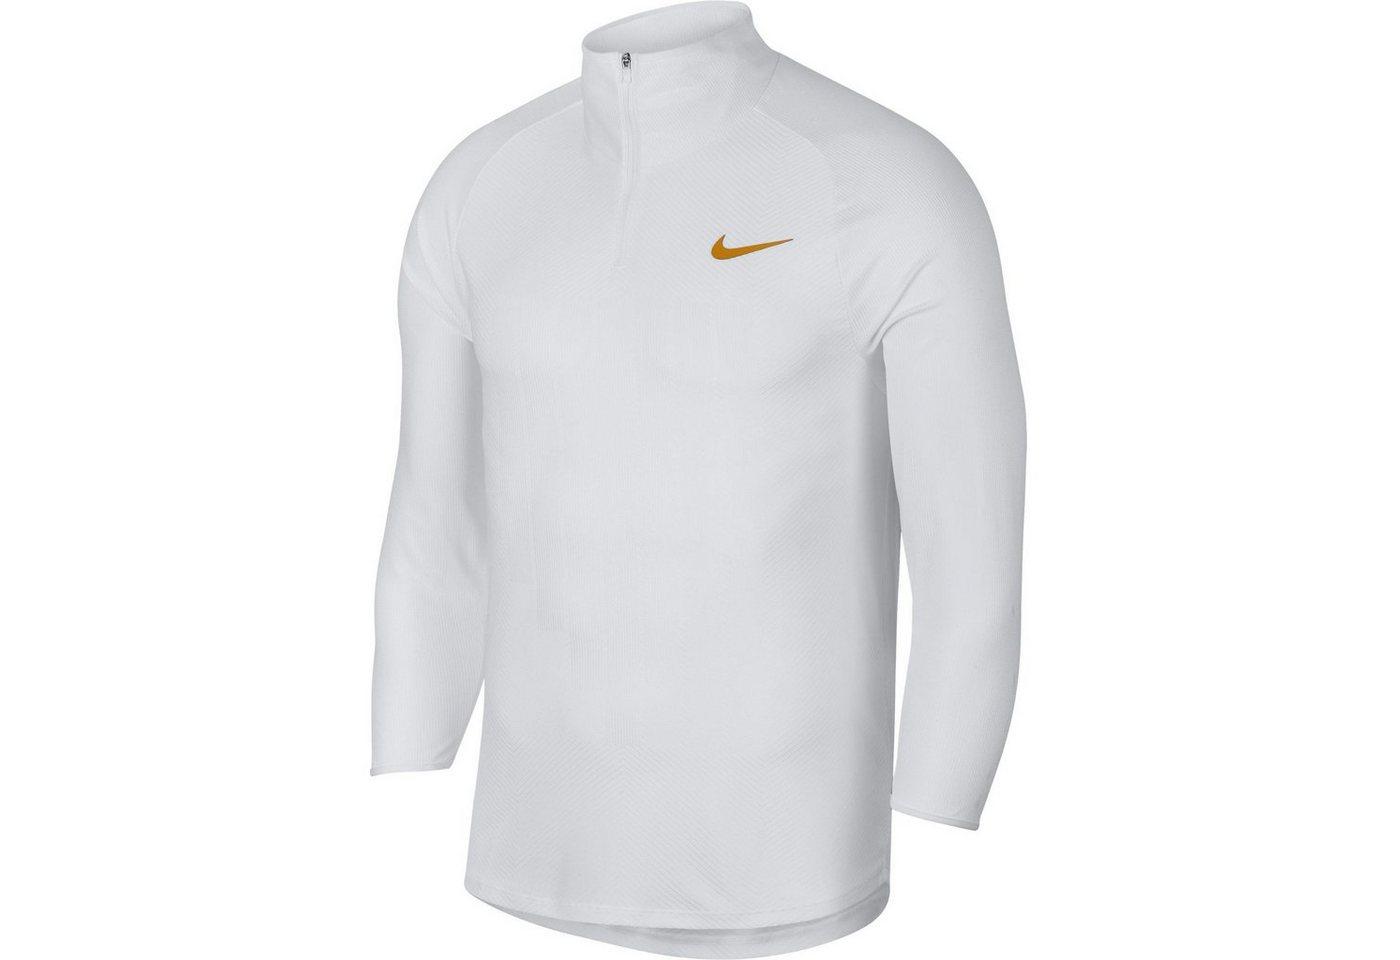 Nike Tennisshirt »WB Shared & Dimitrov« | Sportbekleidung > Sportshirts > Tennisshirts | Weiß | Polyester - Elastan | Nike